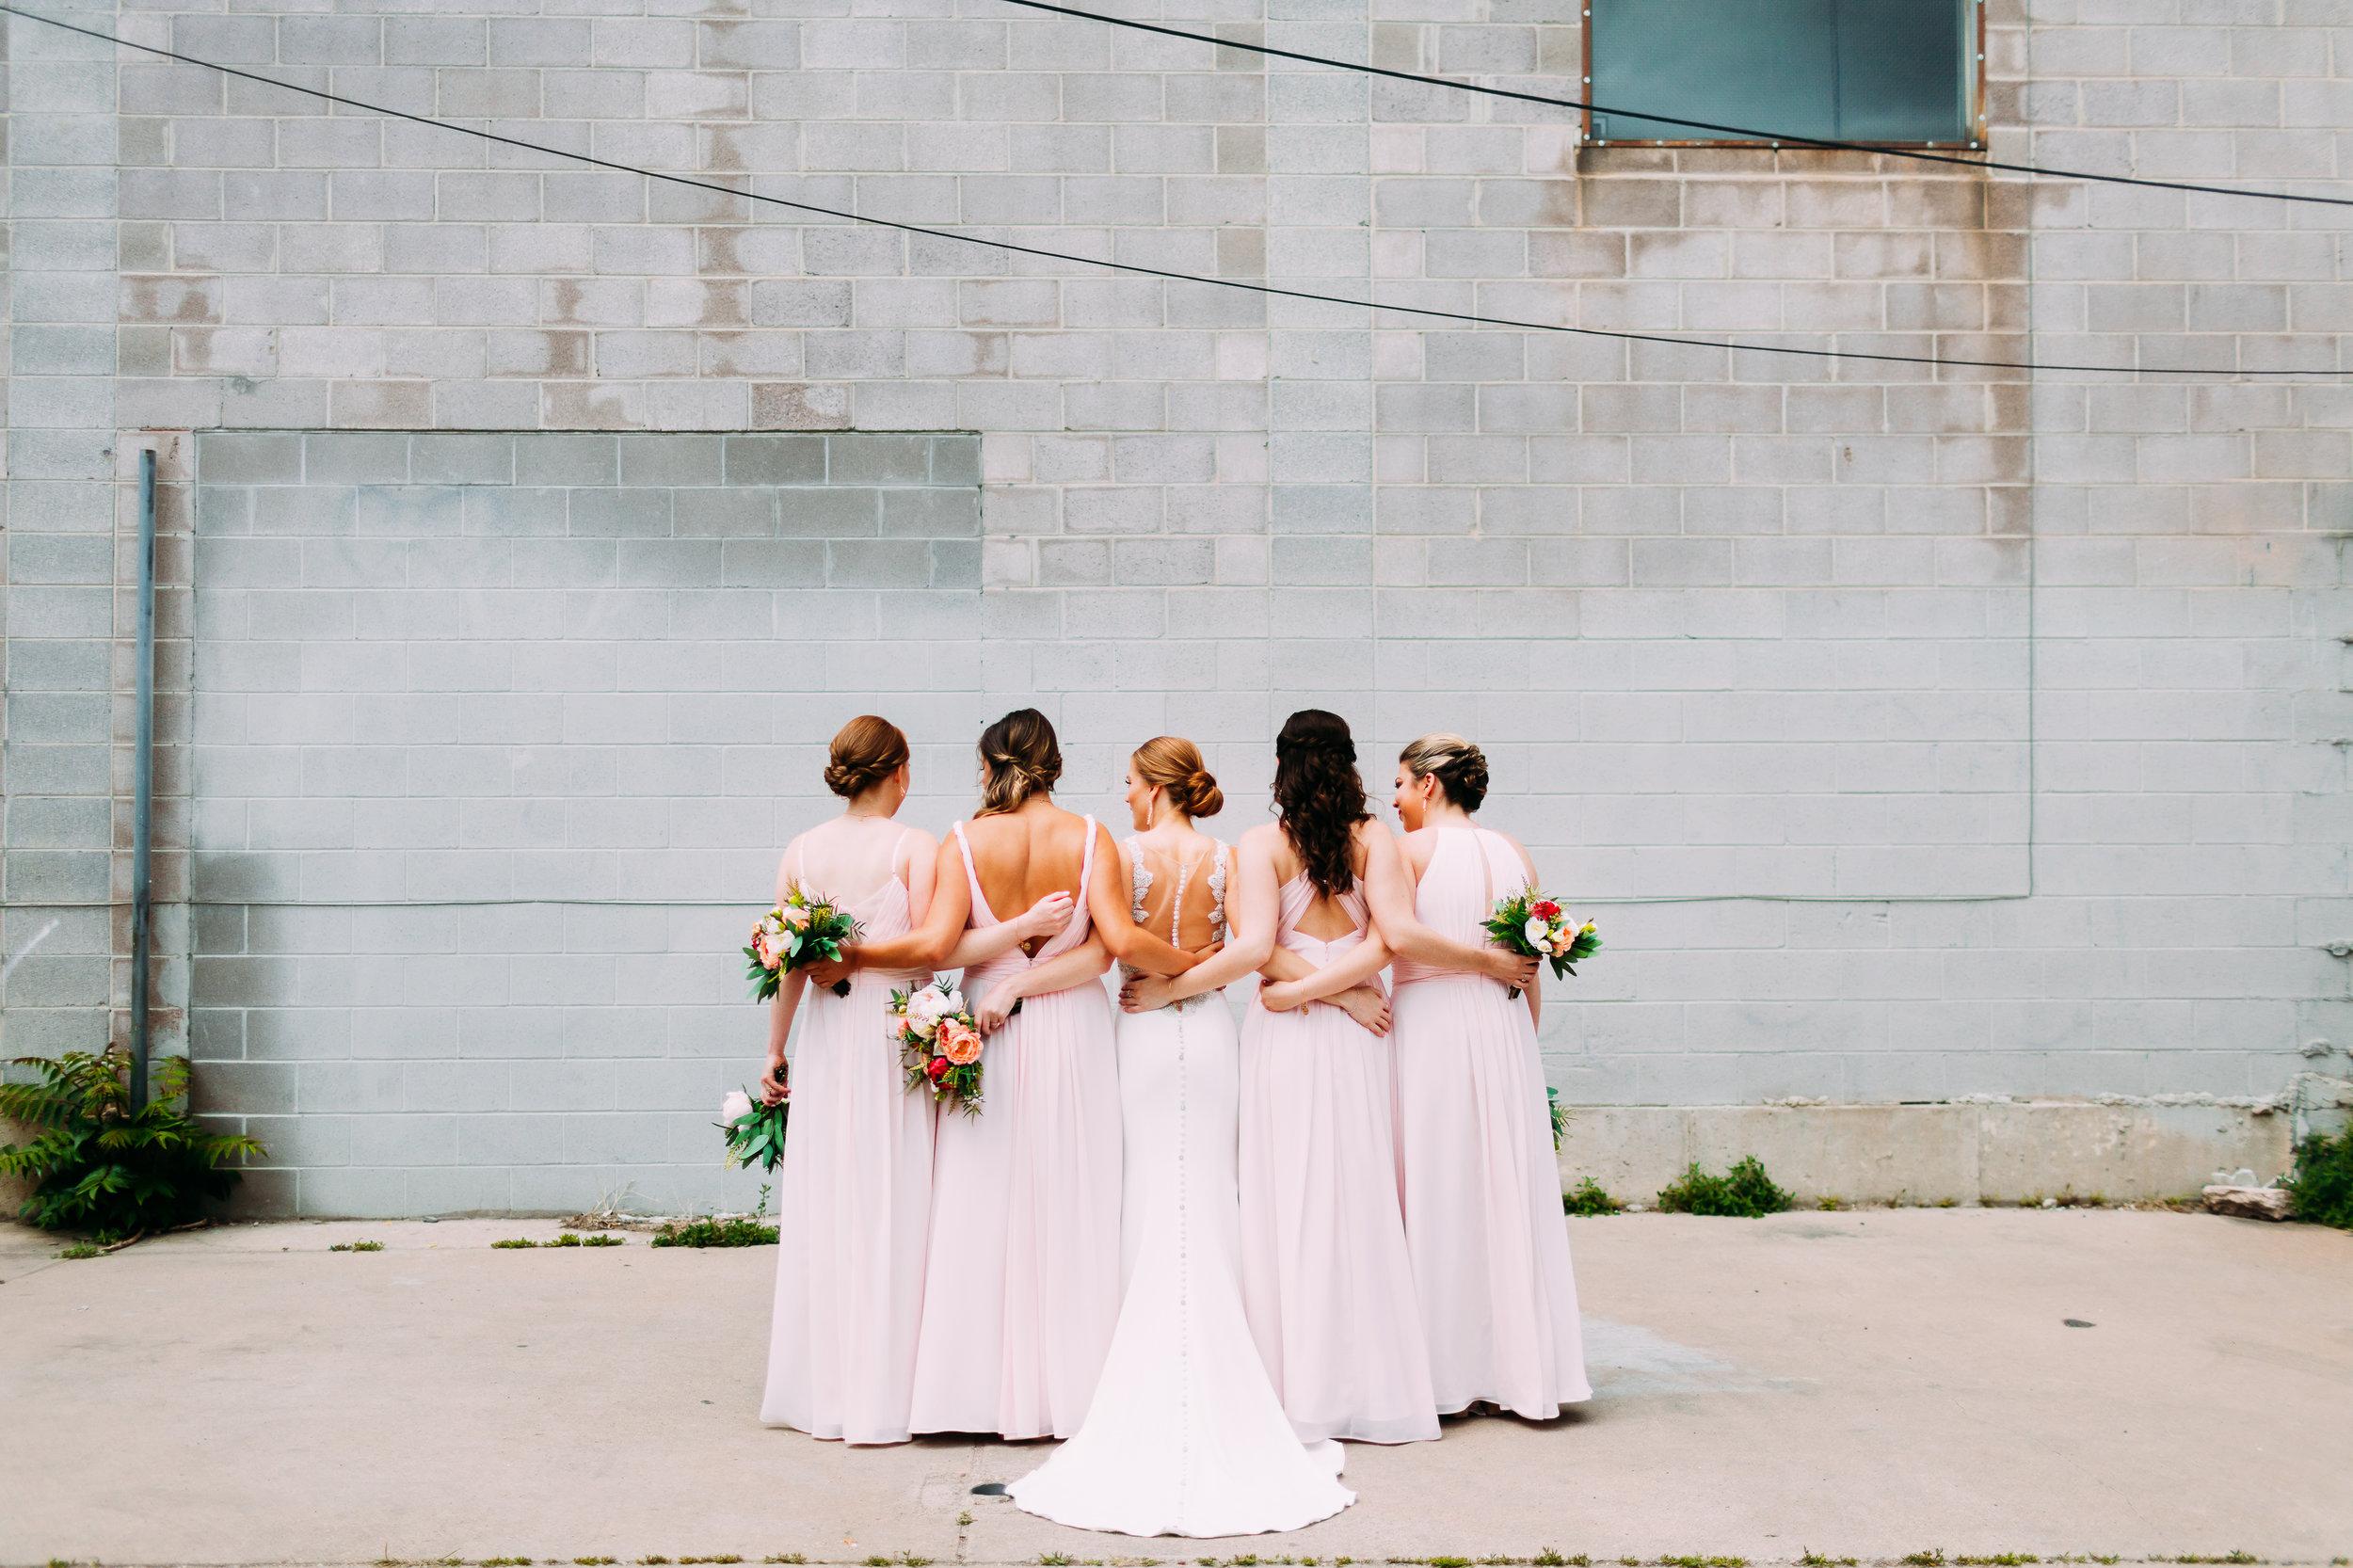 Denver_Skylight_Wedding_Photographer_Santa_Fe_Arts_Wedding_Photography-1.jpg